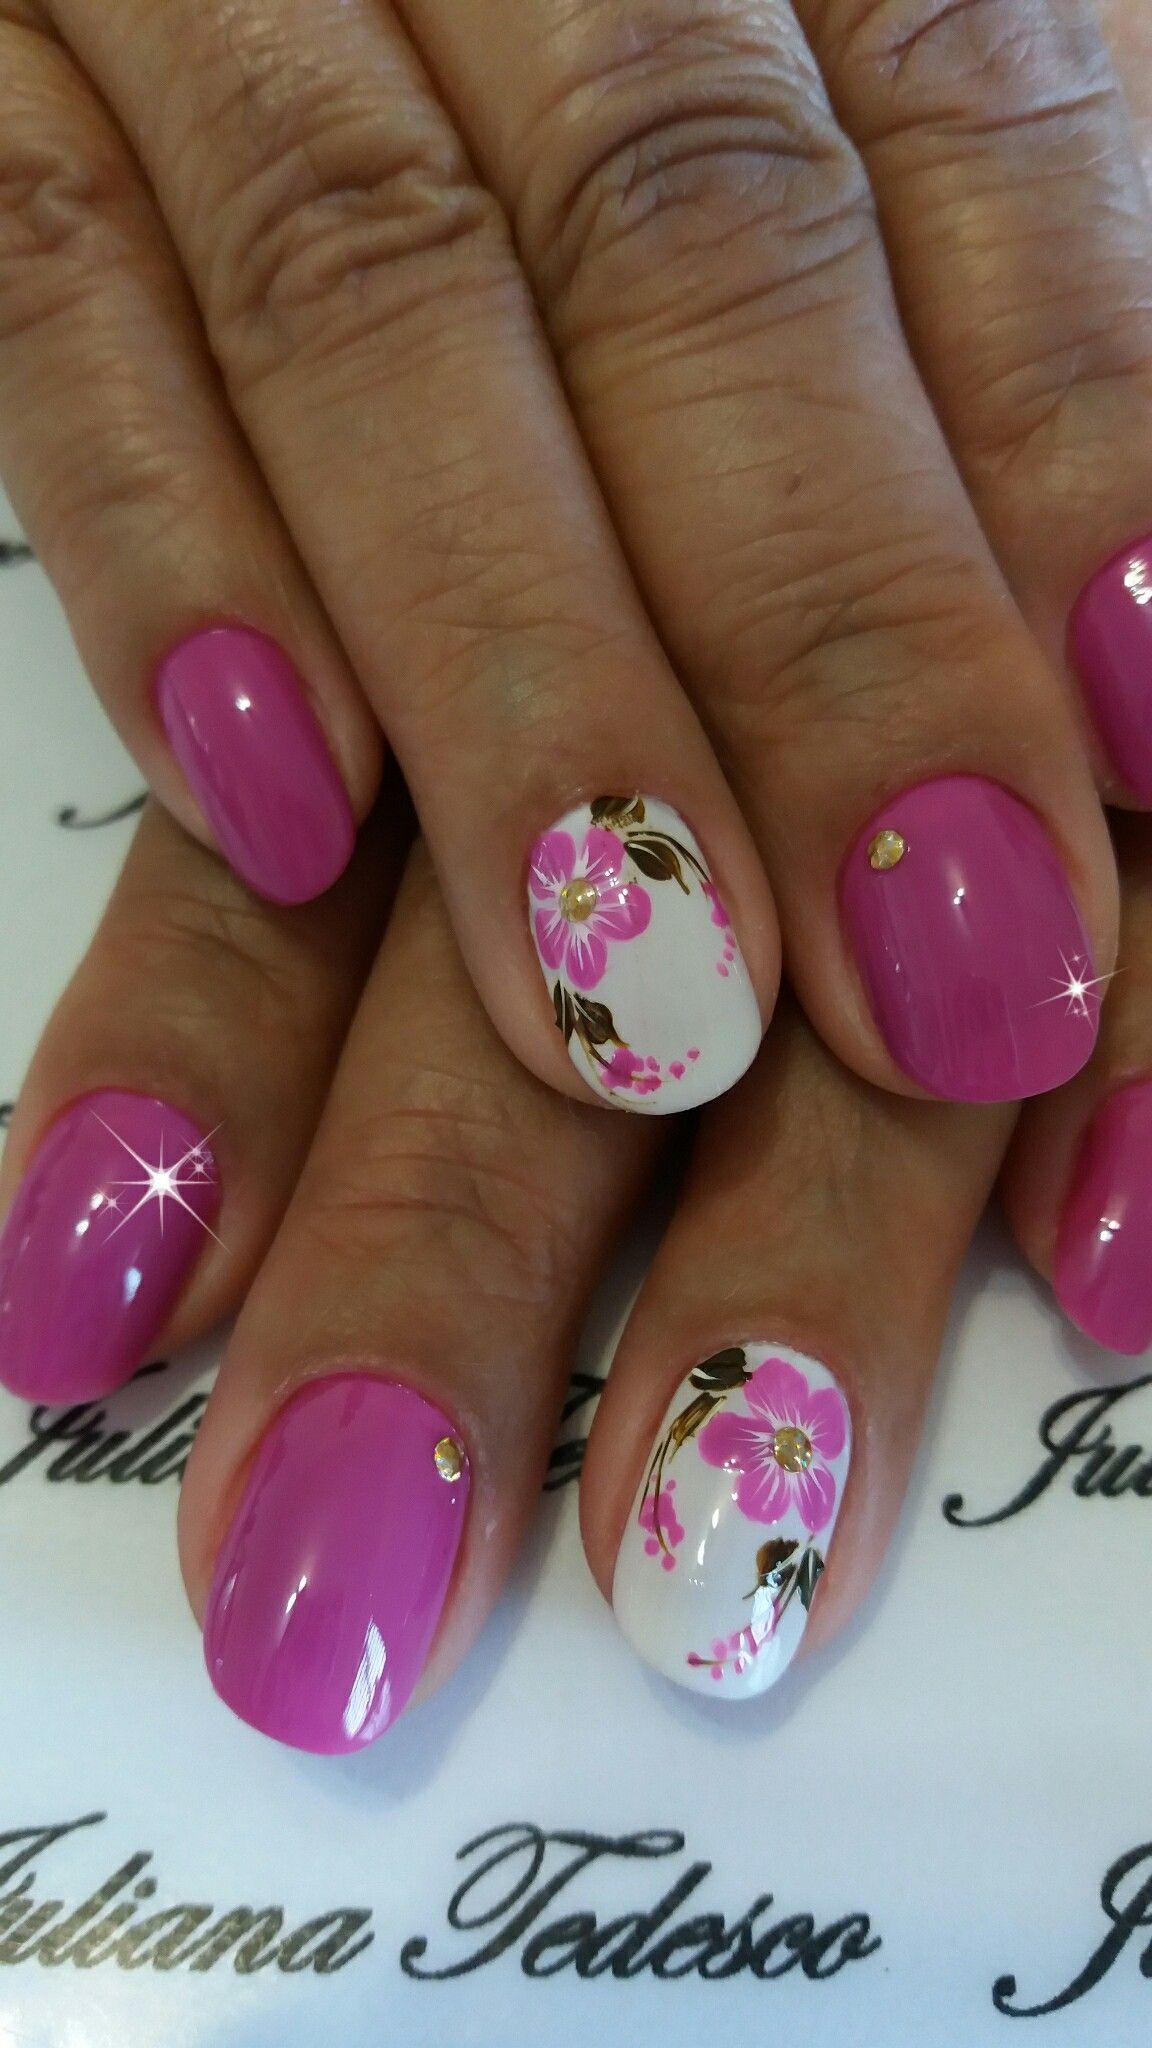 Práctica   Nail Designs   Pinterest   Manicure, Pedicures and Mani pedi